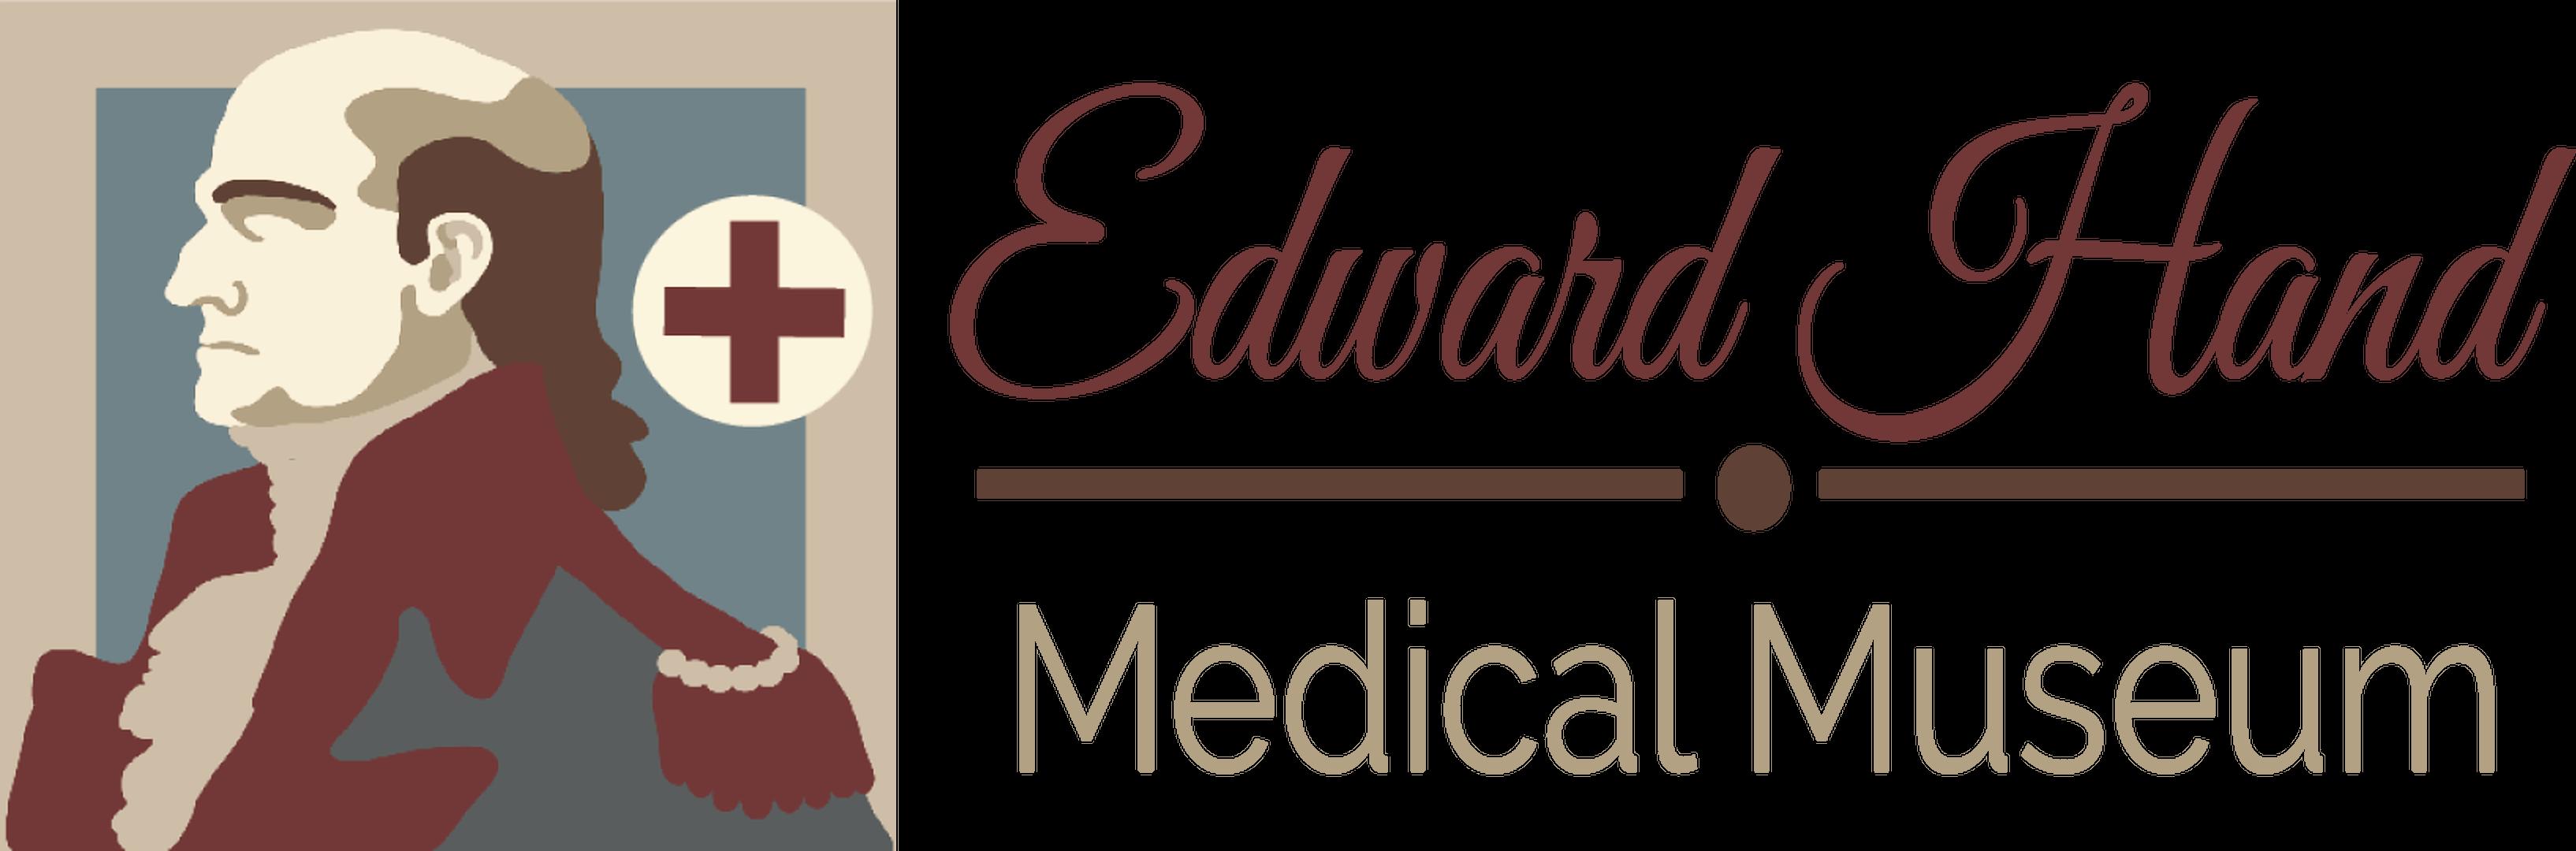 Edward Hand Medical Museum